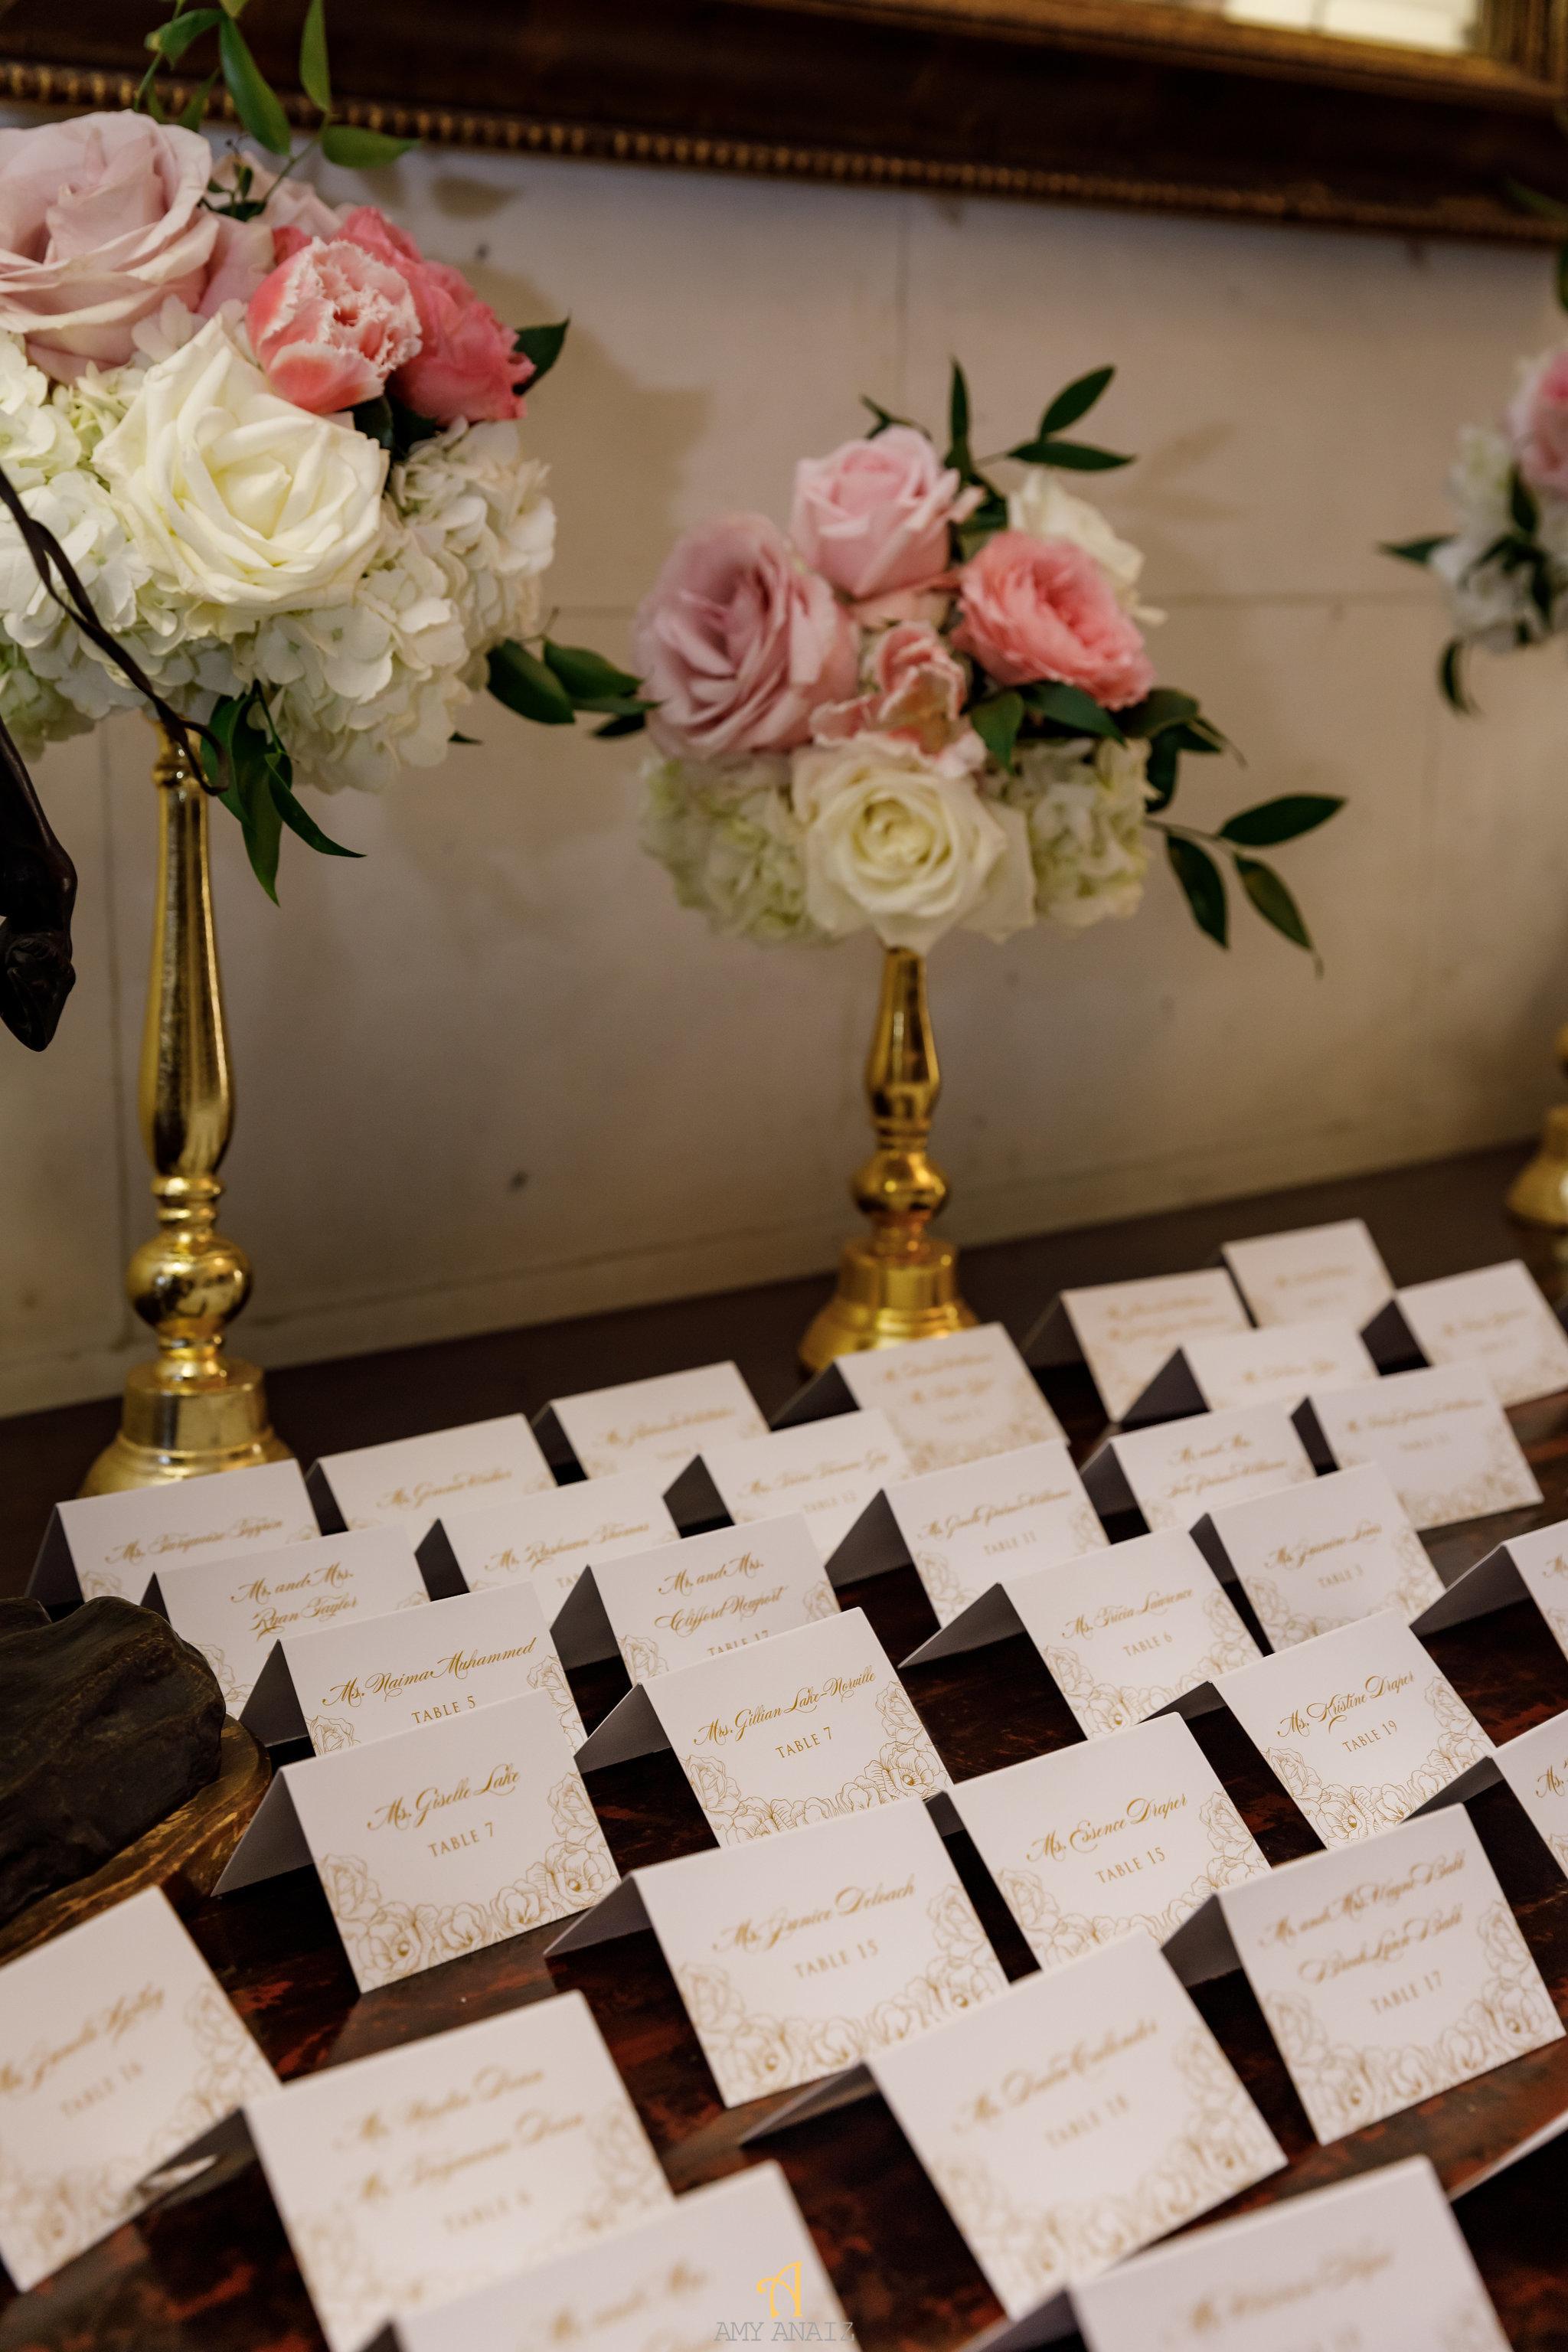 NYIT de Serversky Mansion, Escort Card Table, Wedding Stationery, Long Island Wedding.JPG